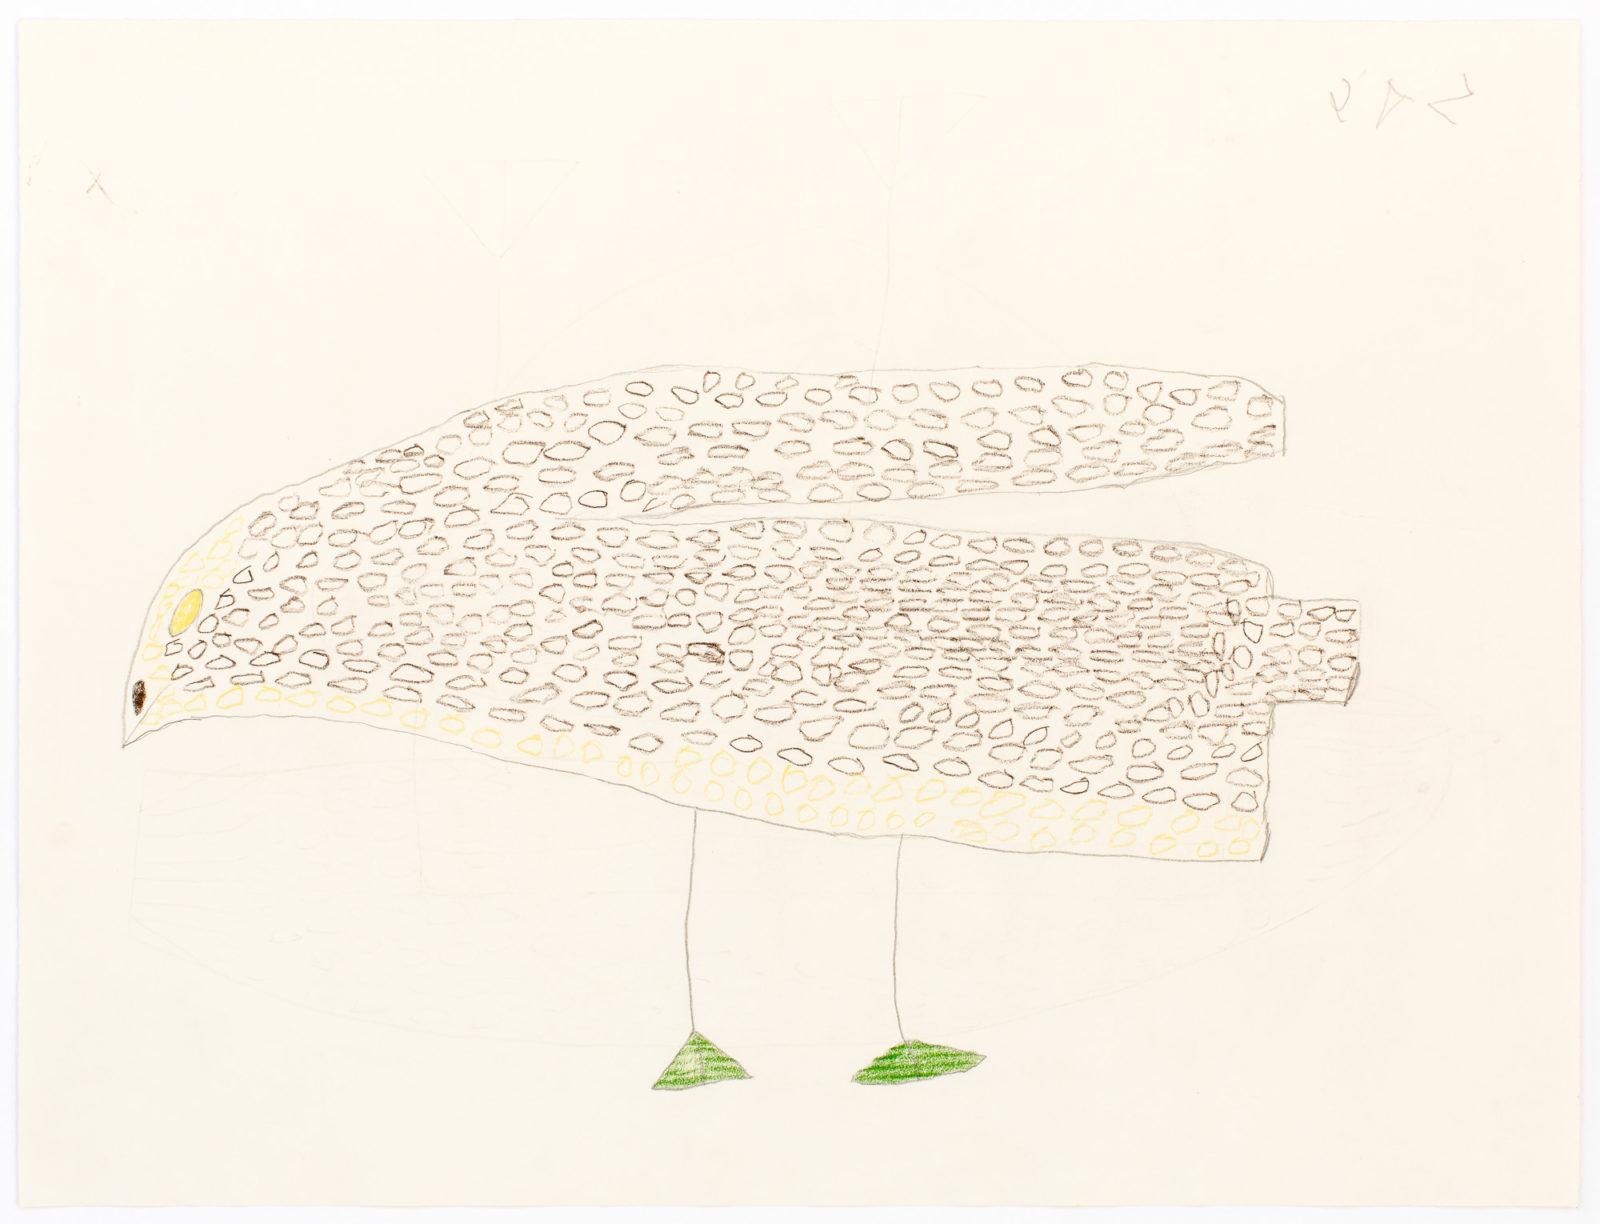 Sheojuk Etidlooie - untitled (bird)